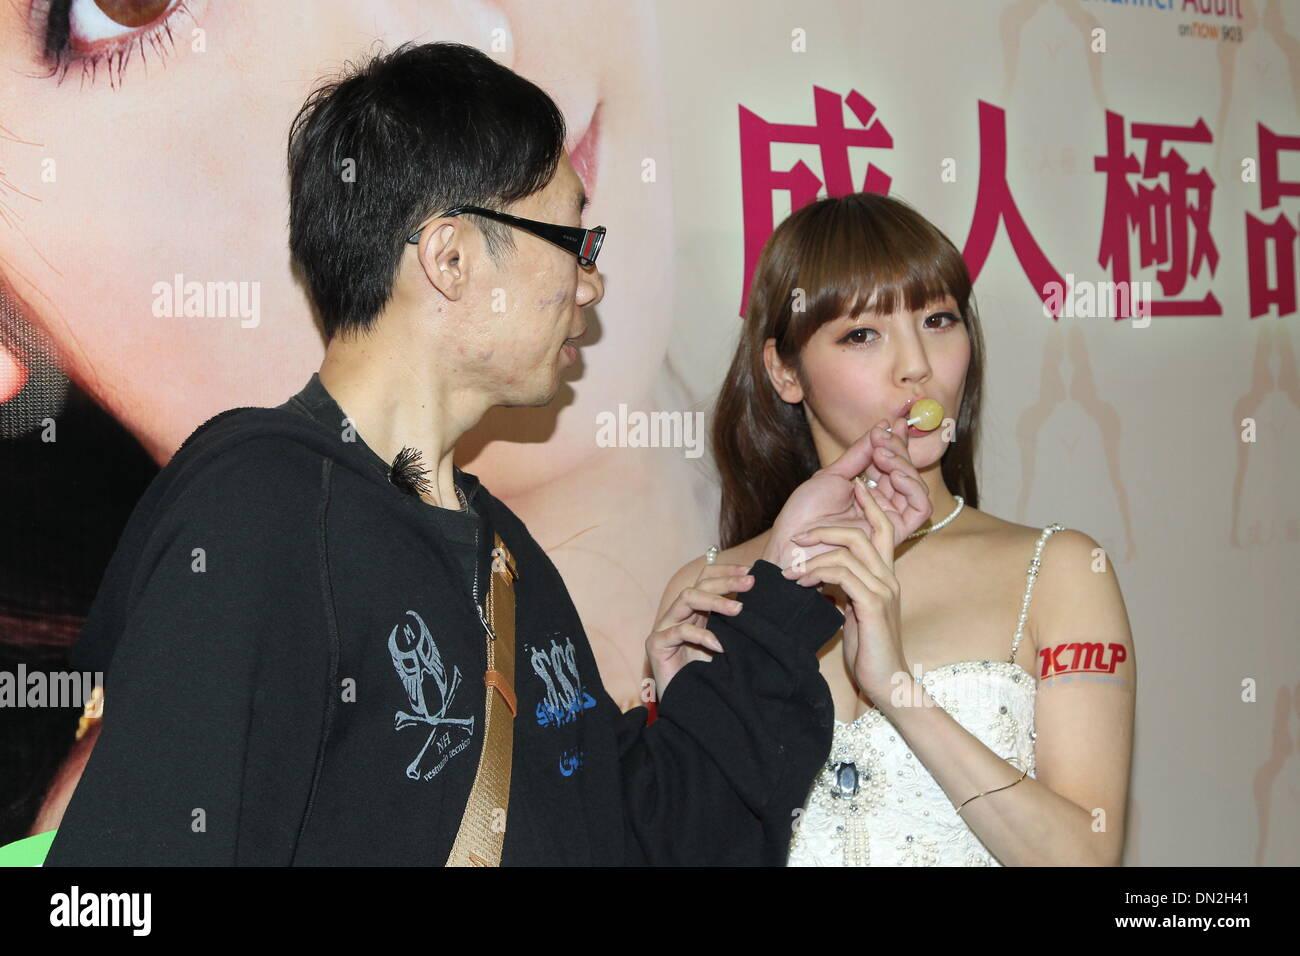 Japanese Av Actress Mizuna Rei Attends